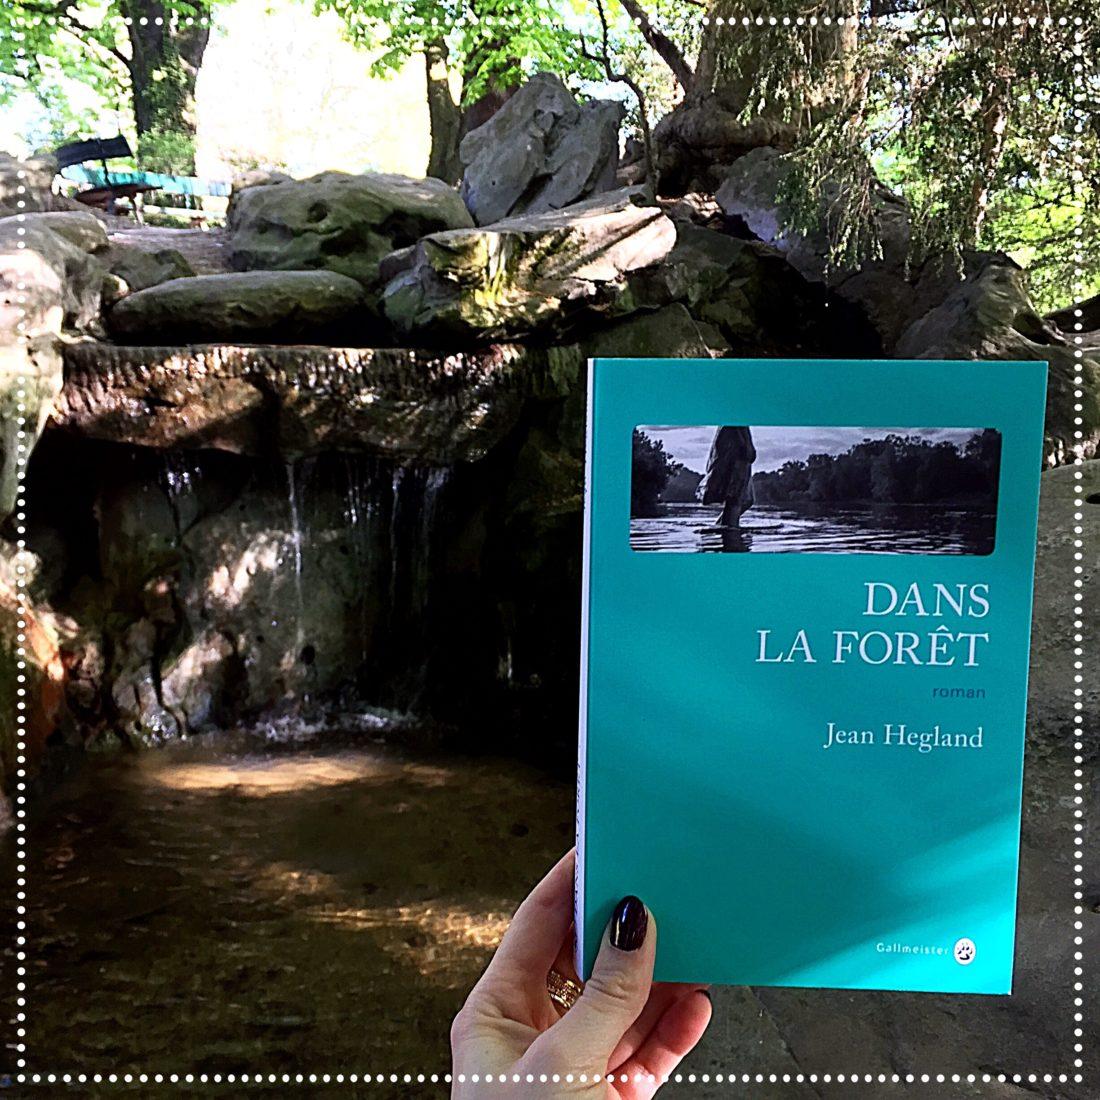 booksnjoy - dans la forêt - jean hegland